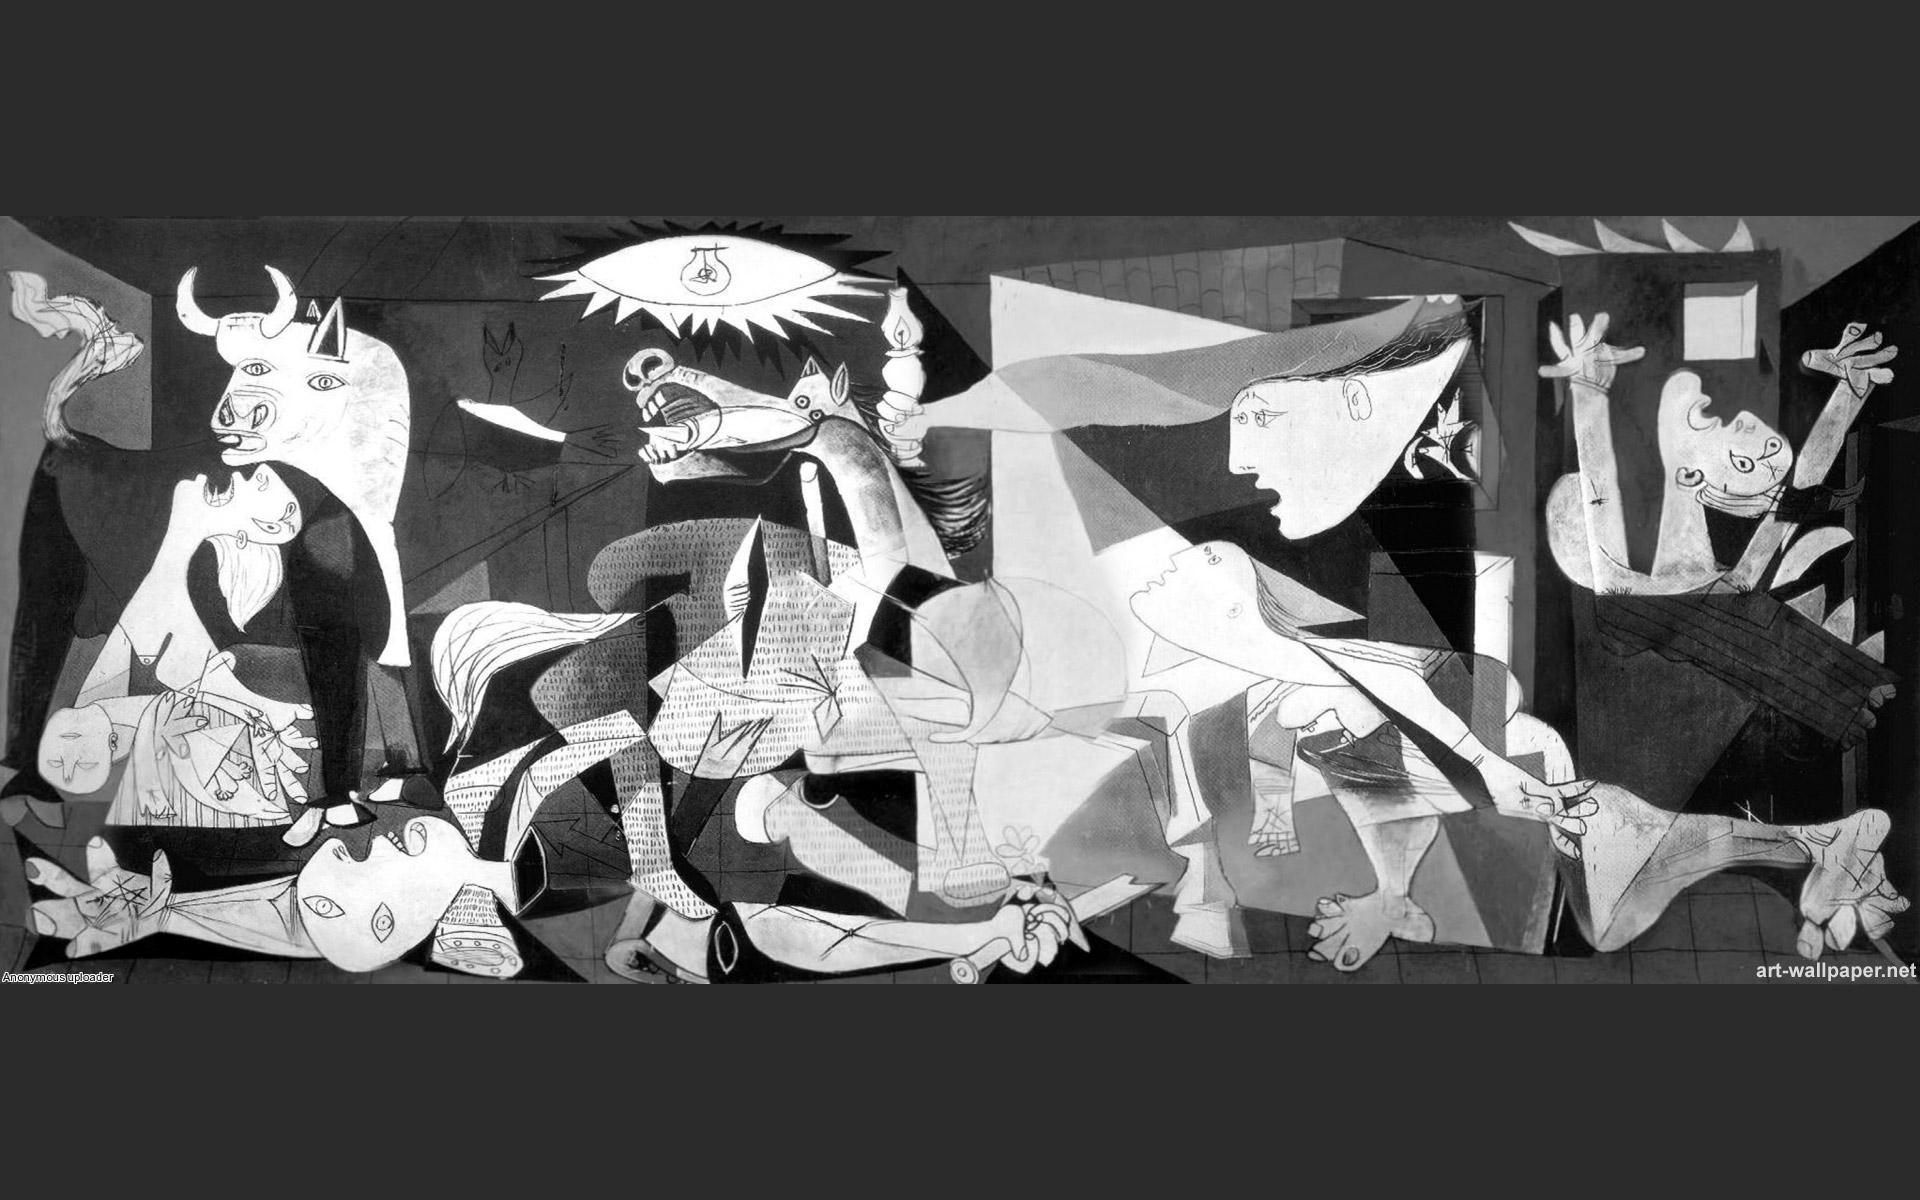 Guernica Wallpaper Art Painting Wall Art Pablo Picasso Wallpaper 1920x1200